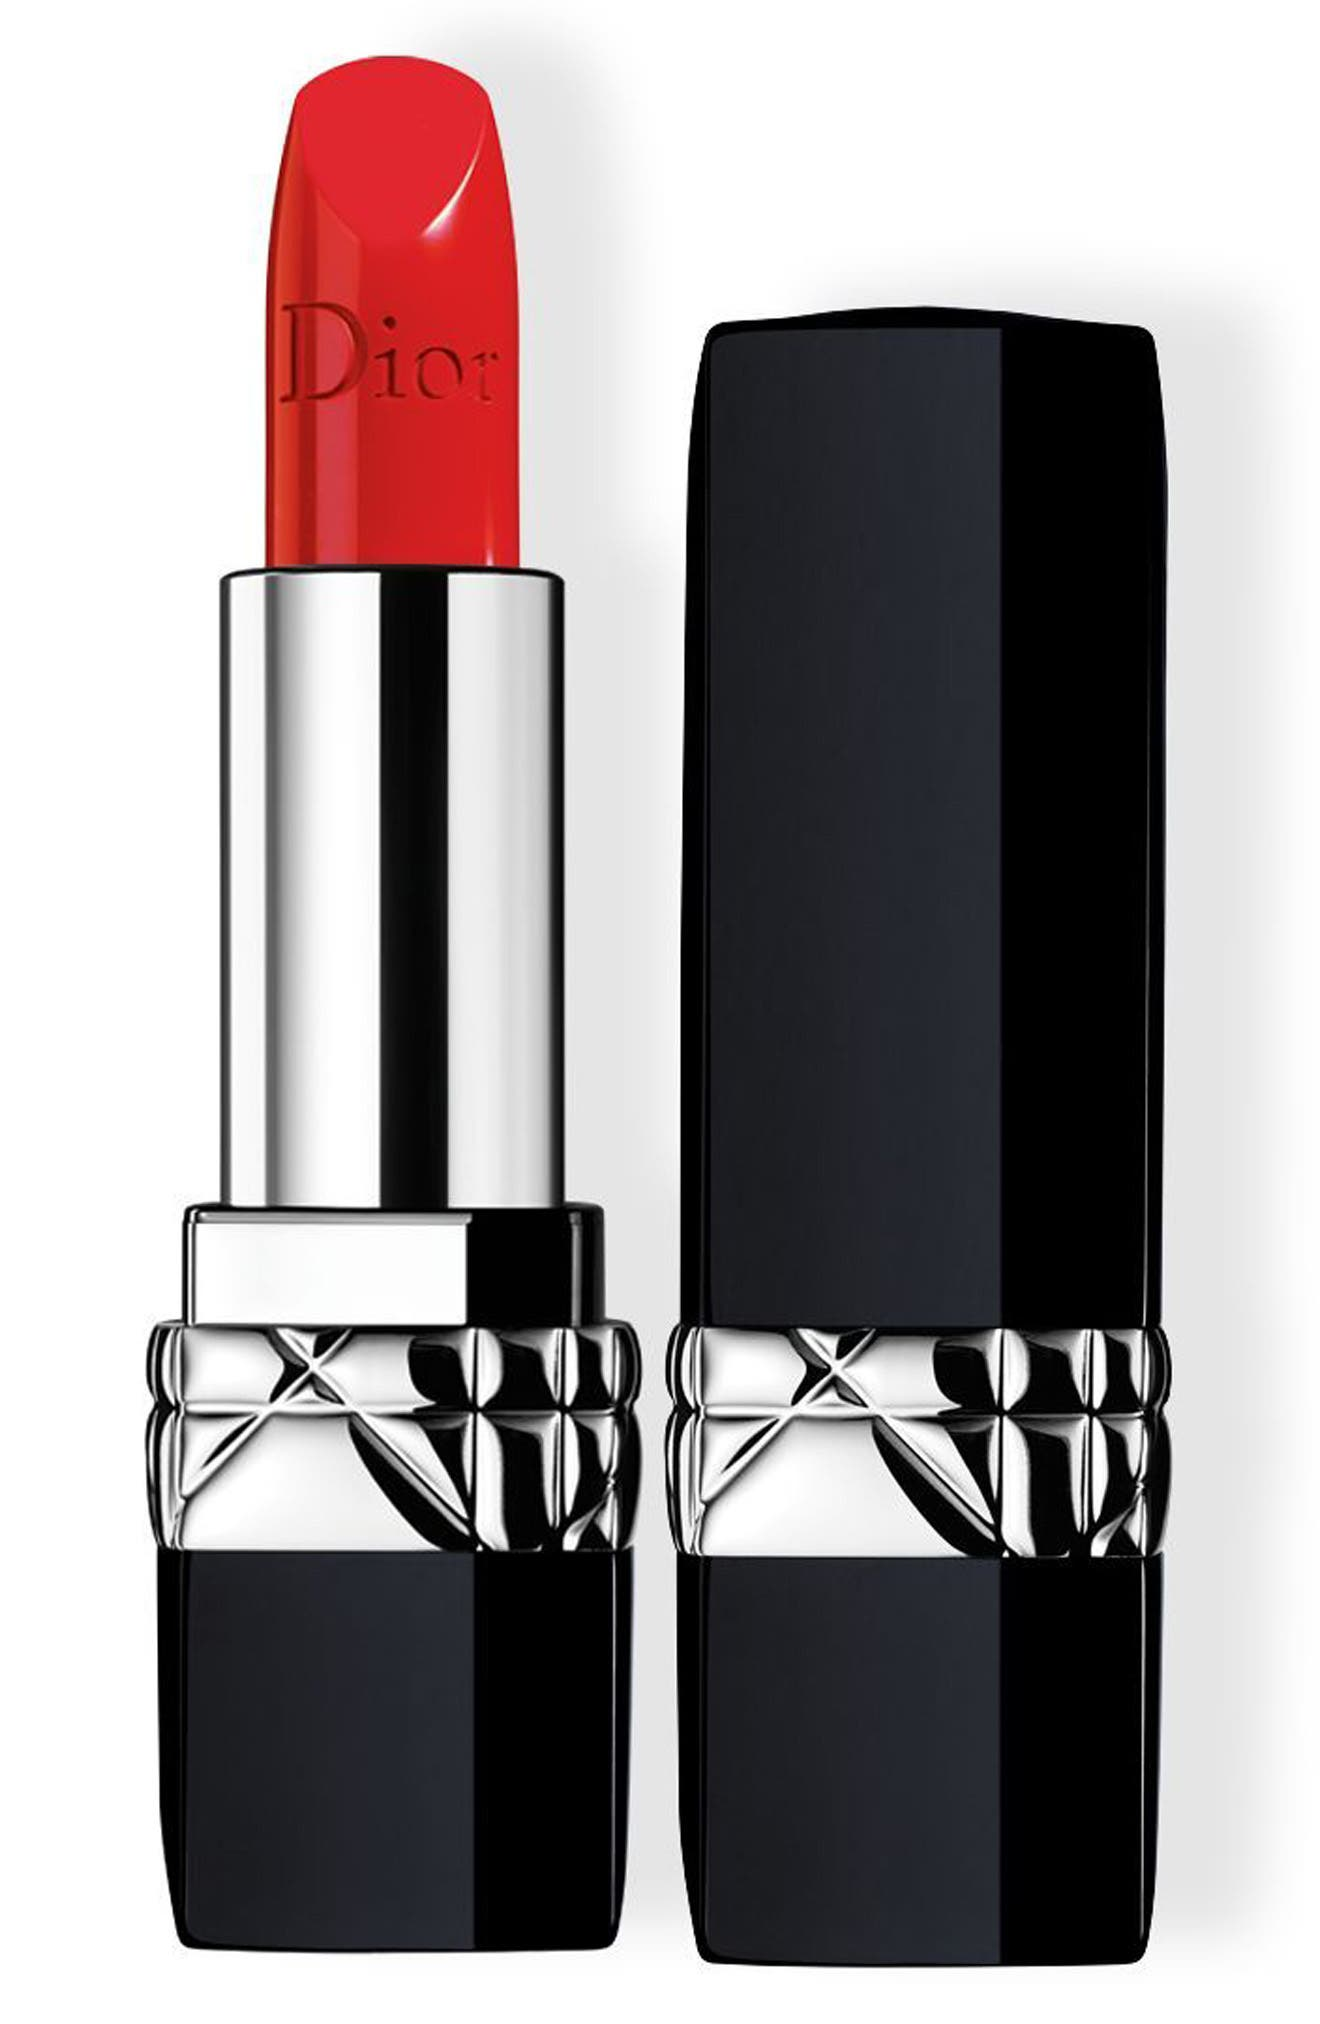 Dior Couture Color Rouge Dior Lipstick - 844 Trafalgar